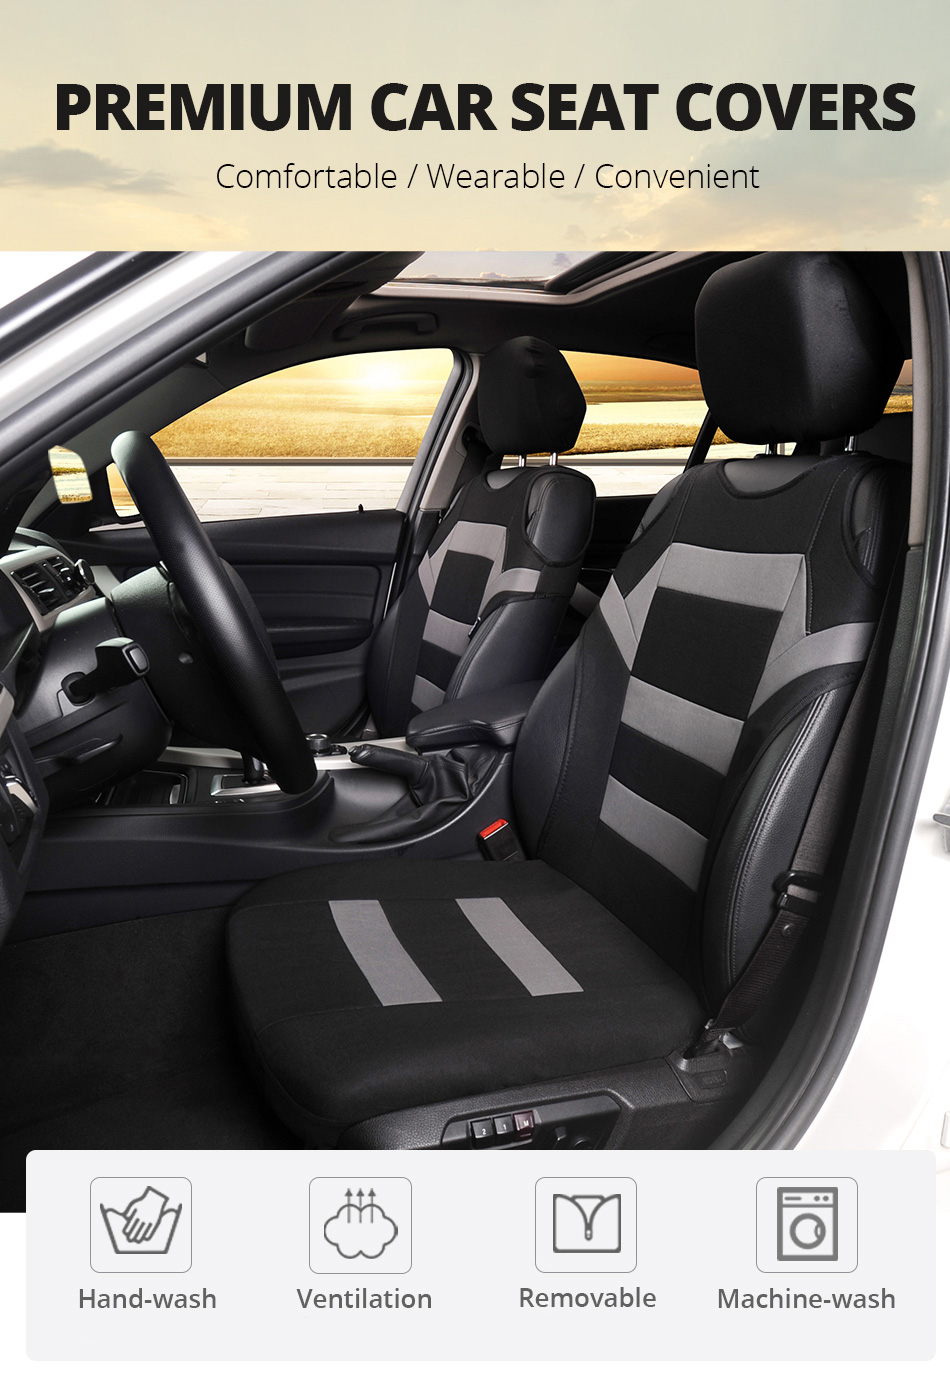 2002 2003 Ford Escort Coupe Black Loop Driver /& Passenger Floor GGBAILEY D3121A-F1A-BK-LP Custom Fit Car Mats for 2001